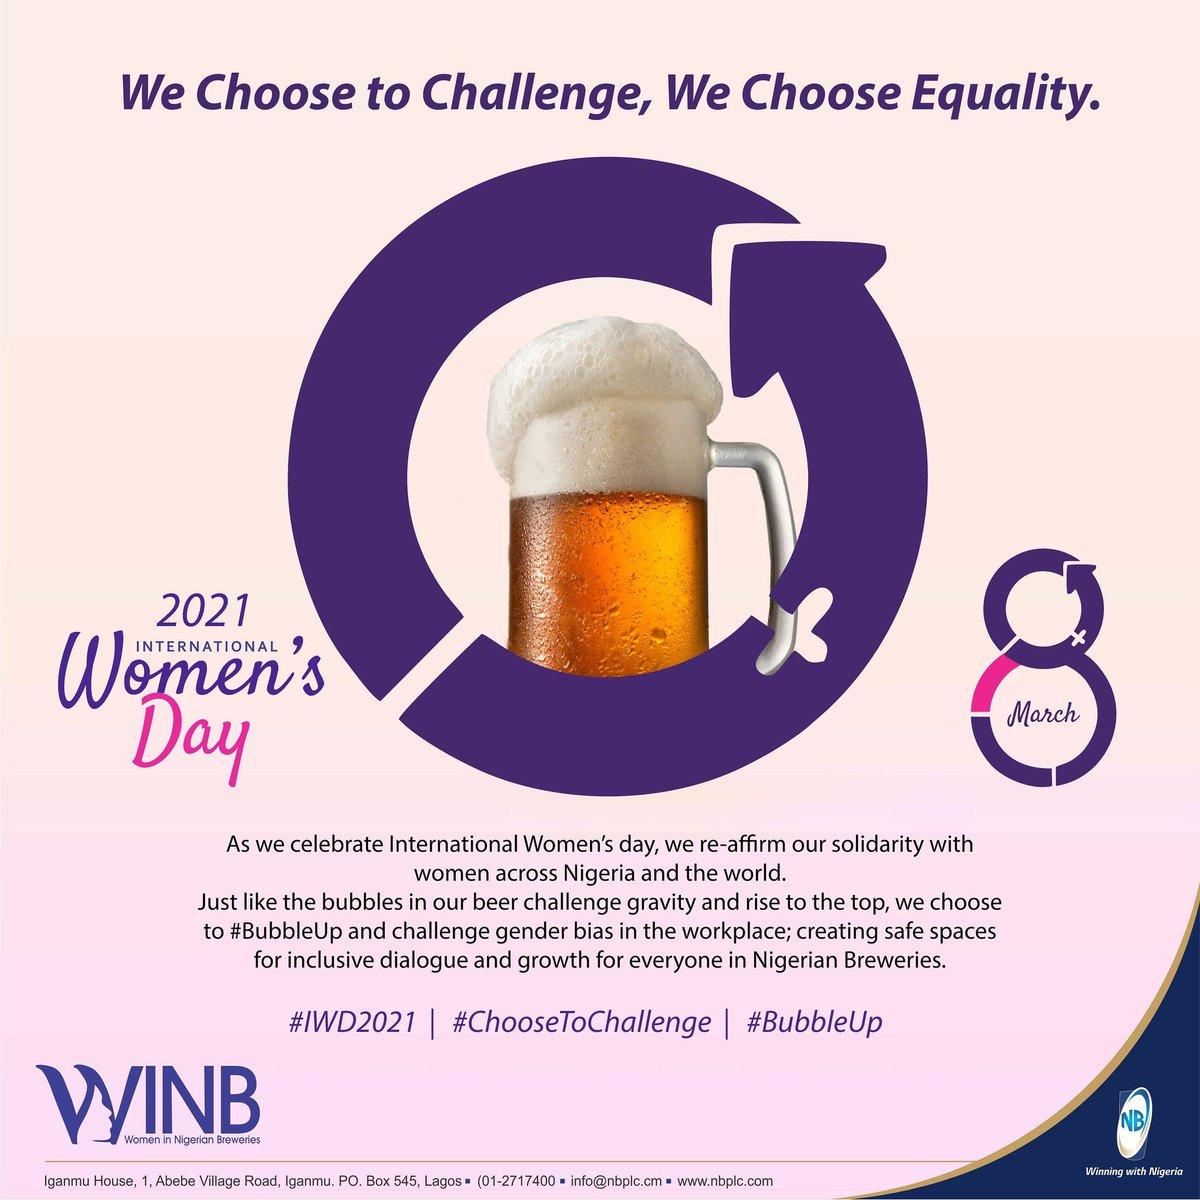 Replying to @NBPLC: We #ChoosetoChallenge.  We Choose Equality.  #IWD2021 #BubbleUp #WeAreNBPlc